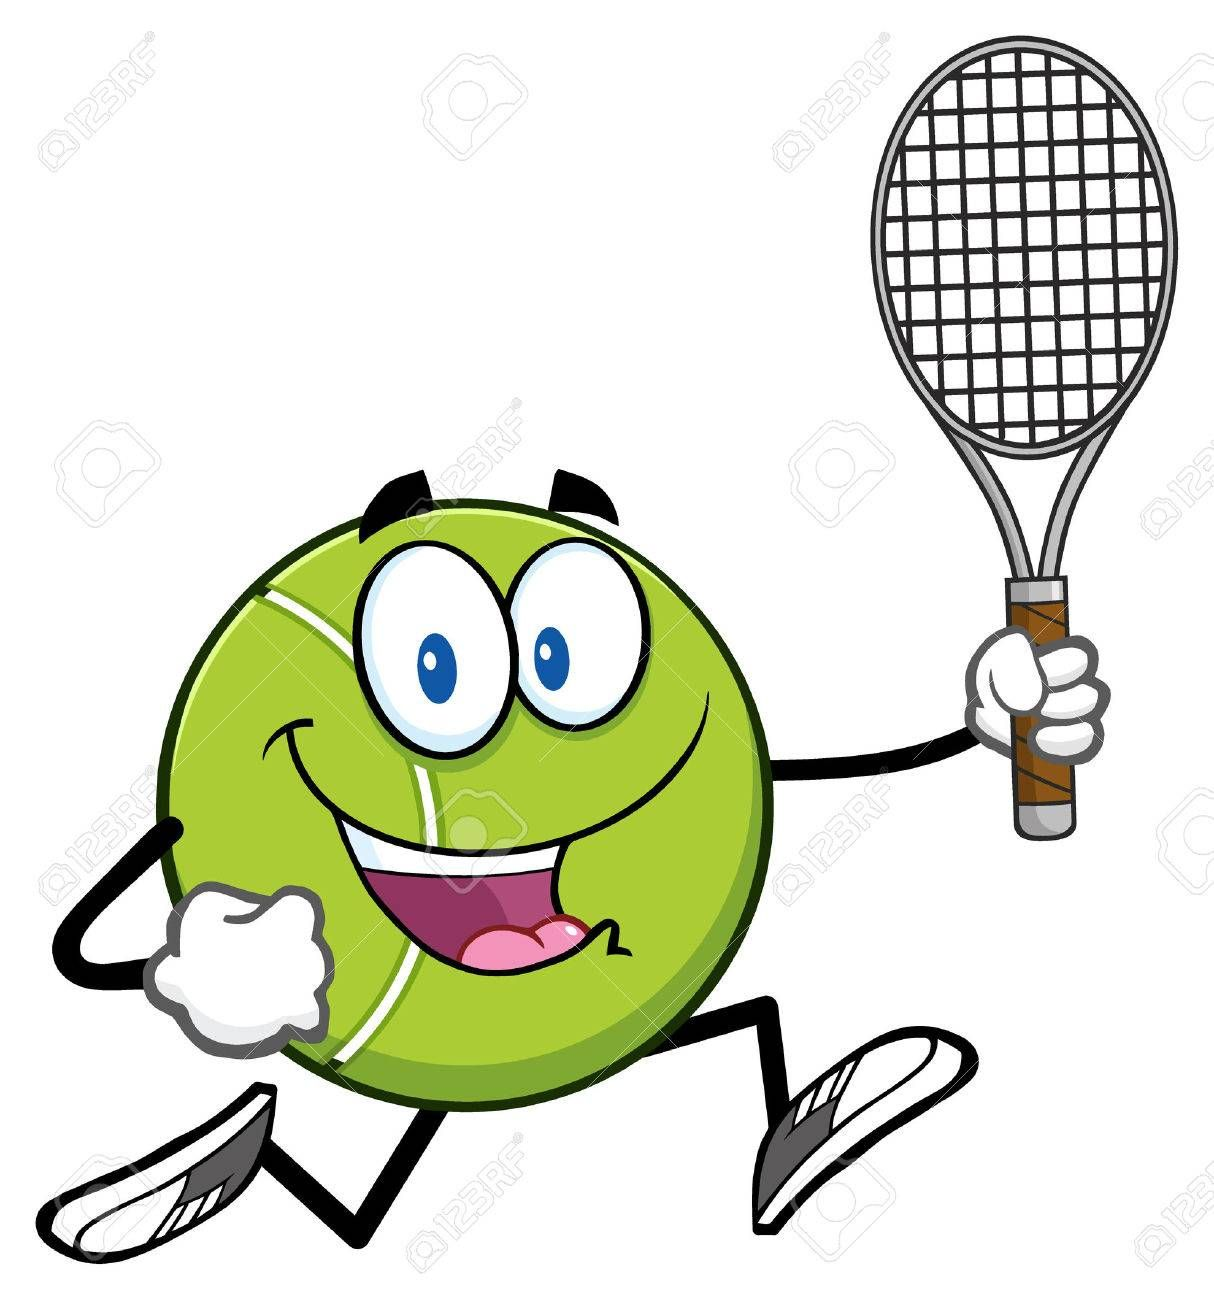 Tennis Ball Cartoon Character Running With Racket Ad Cartoon Ball Tennis Racket Running Tennis Ball Cartoon Characters Cartoon